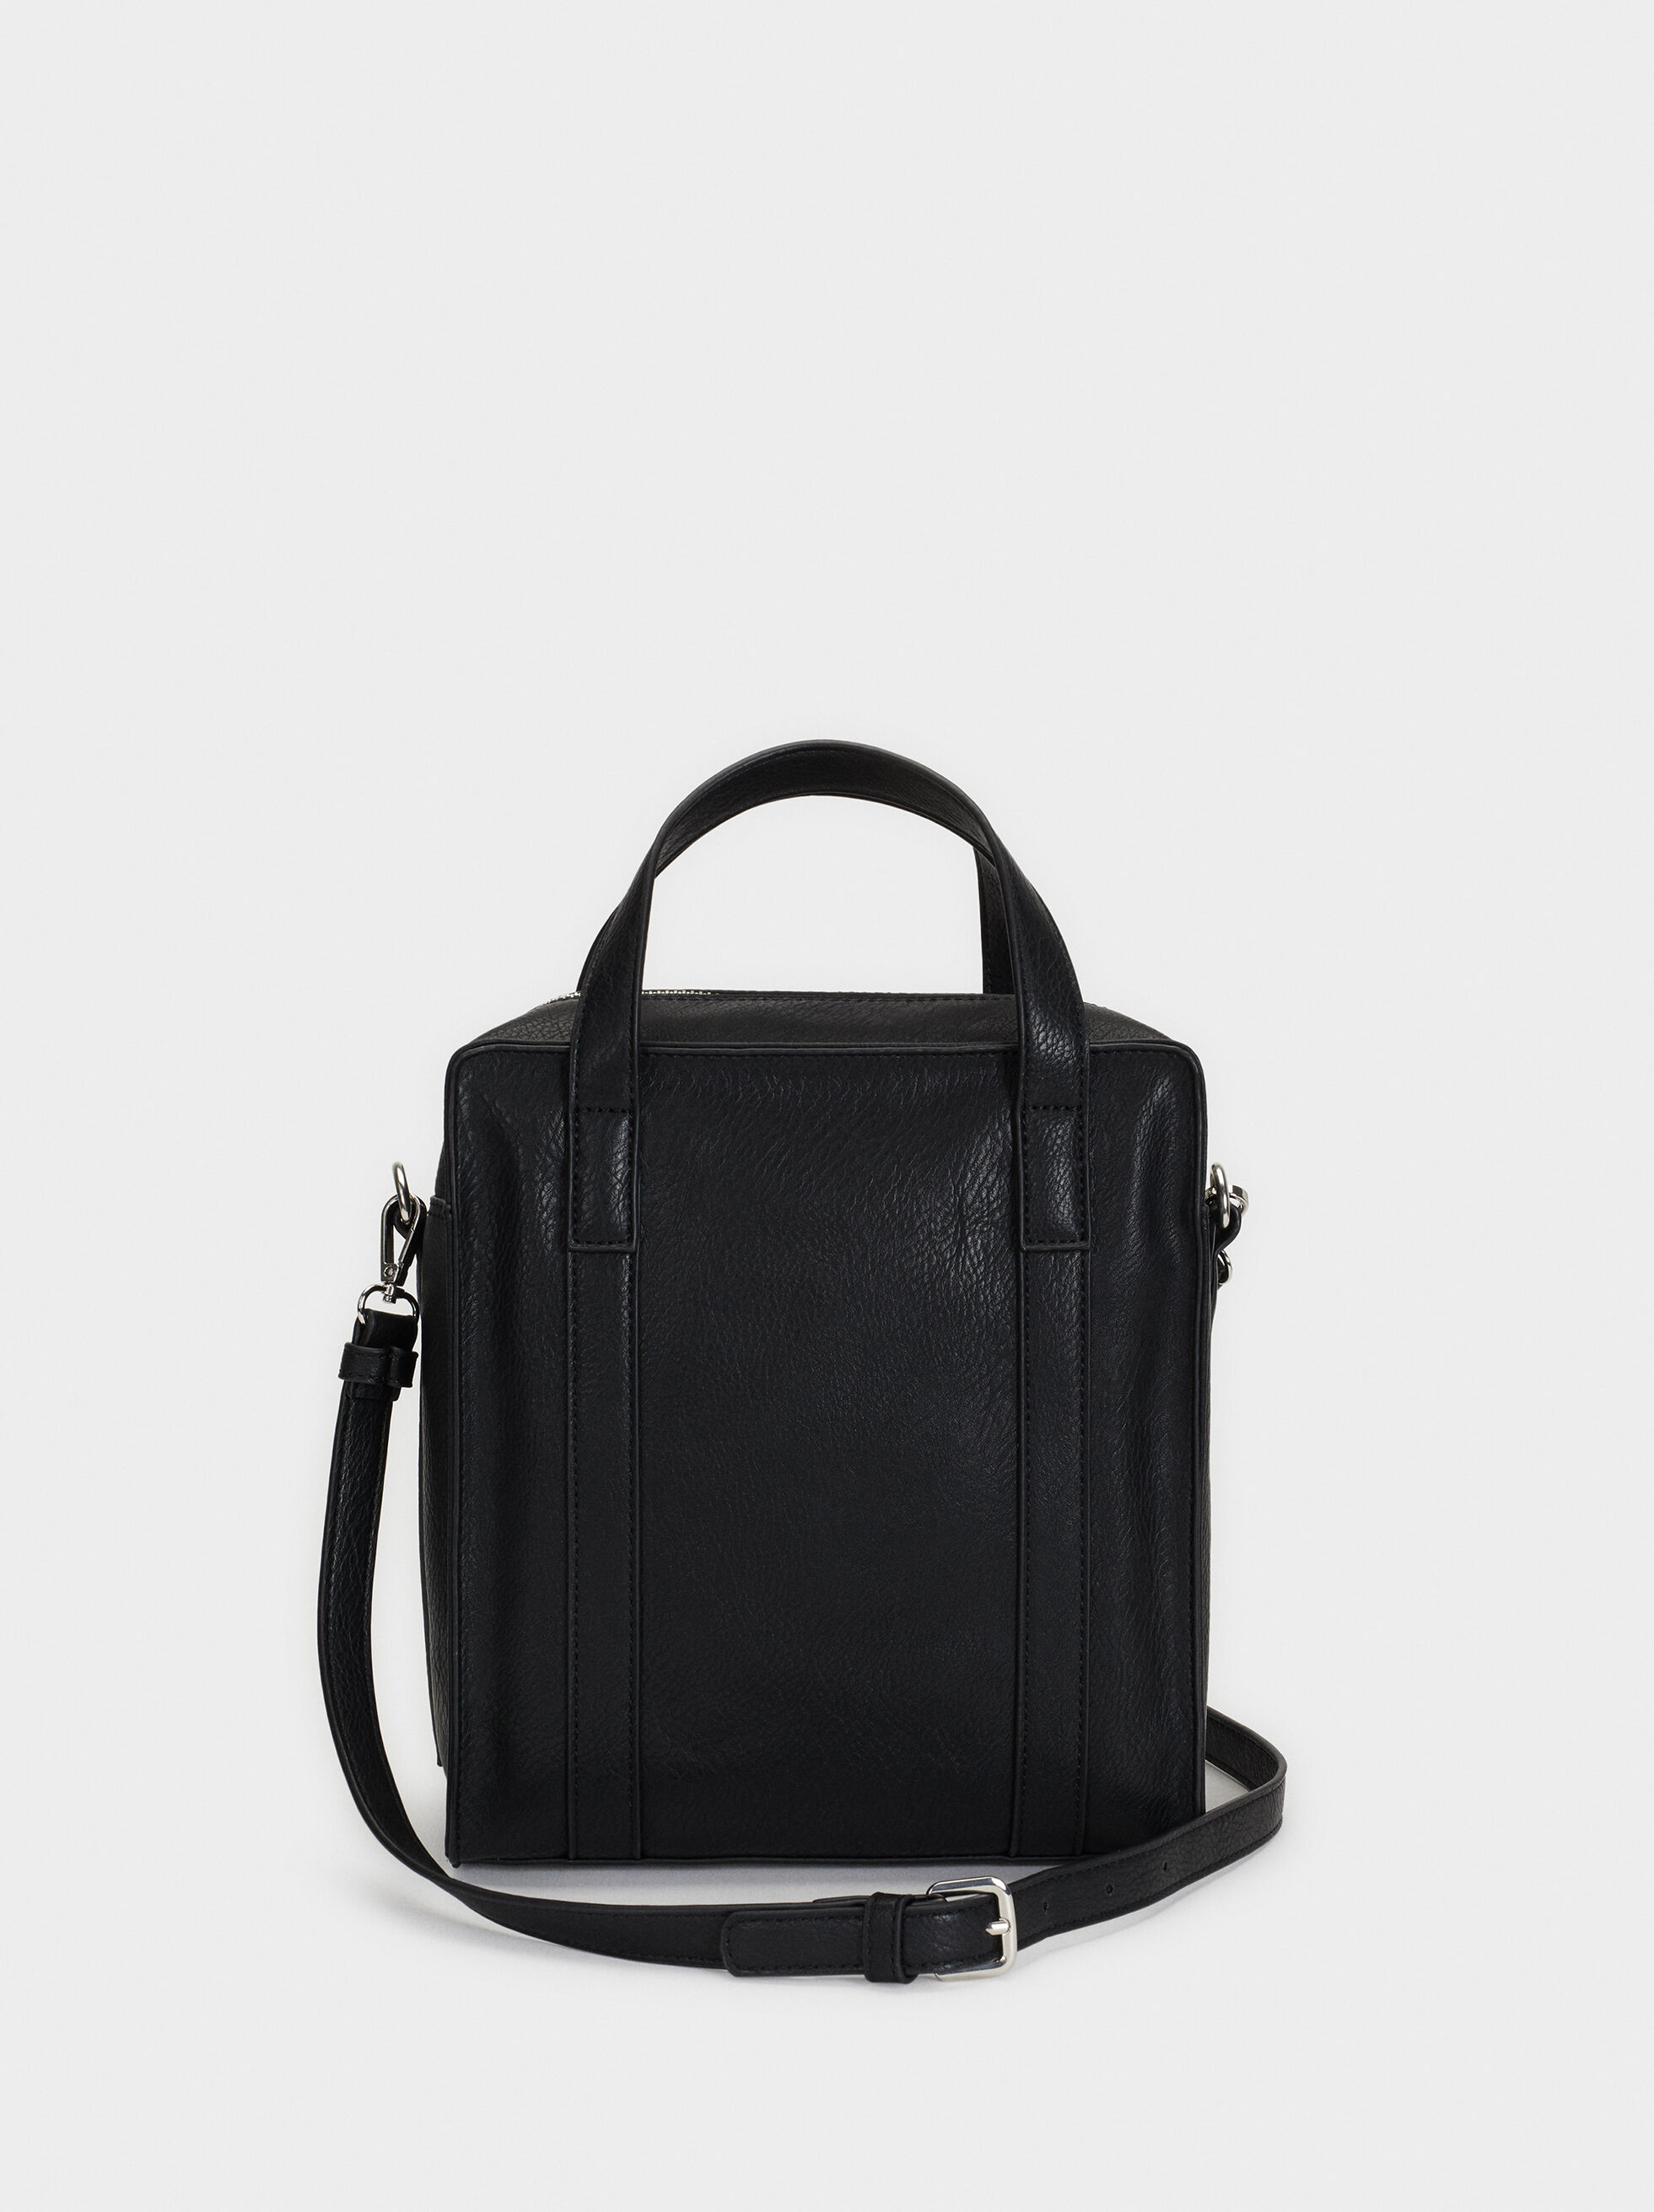 Zip-Fastening Tote Bag, Black, hi-res